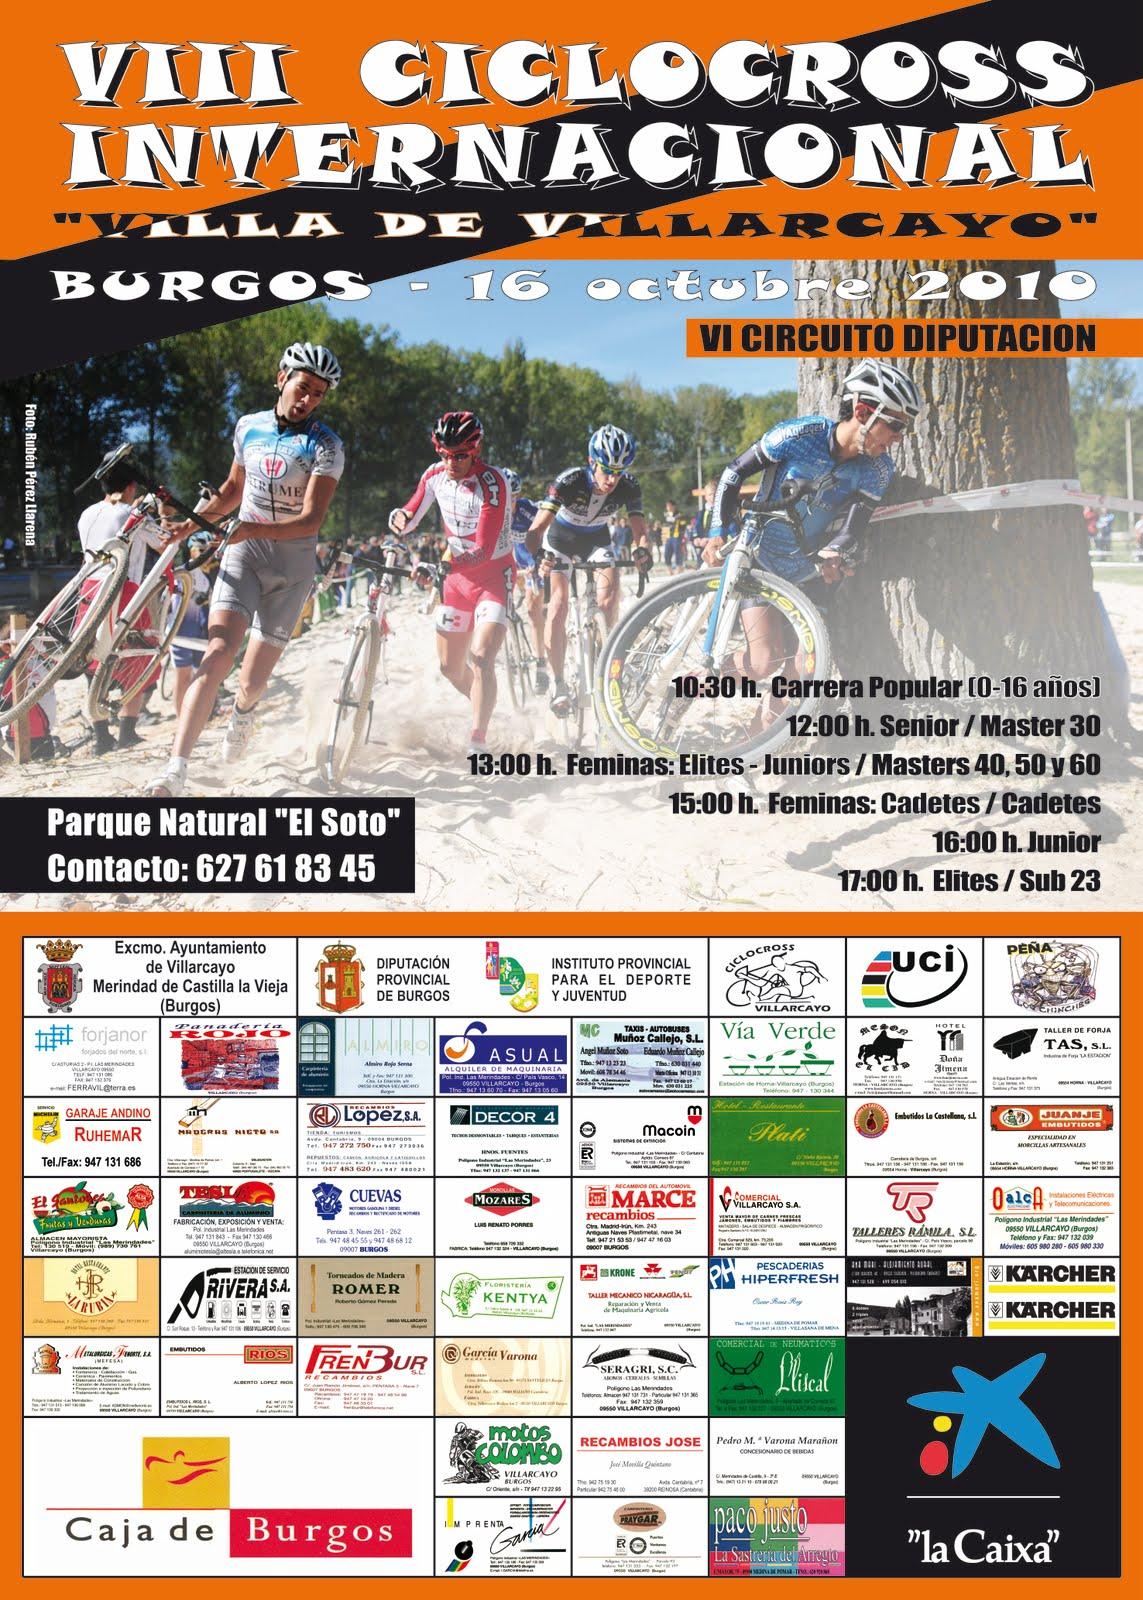 Cartel Ciclocross Internacional Villarcayo